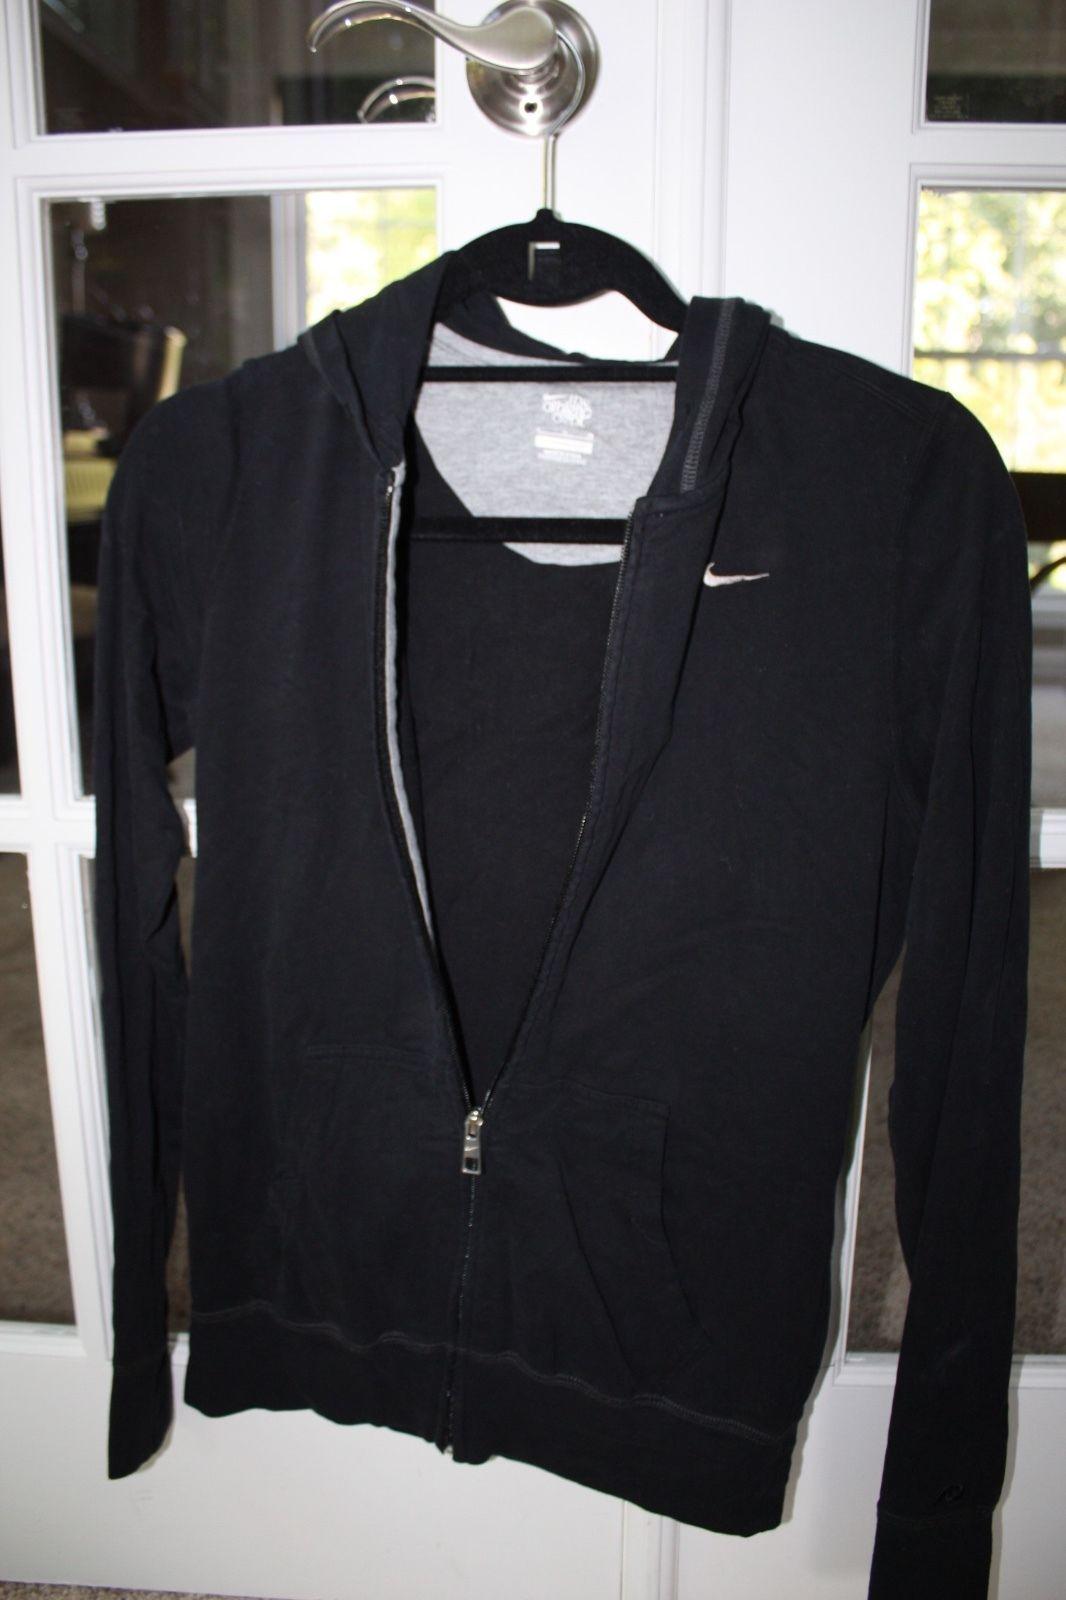 2bbf6bfad91d Nike Athletic Dept Wear Black Large Jacket and 50 similar items